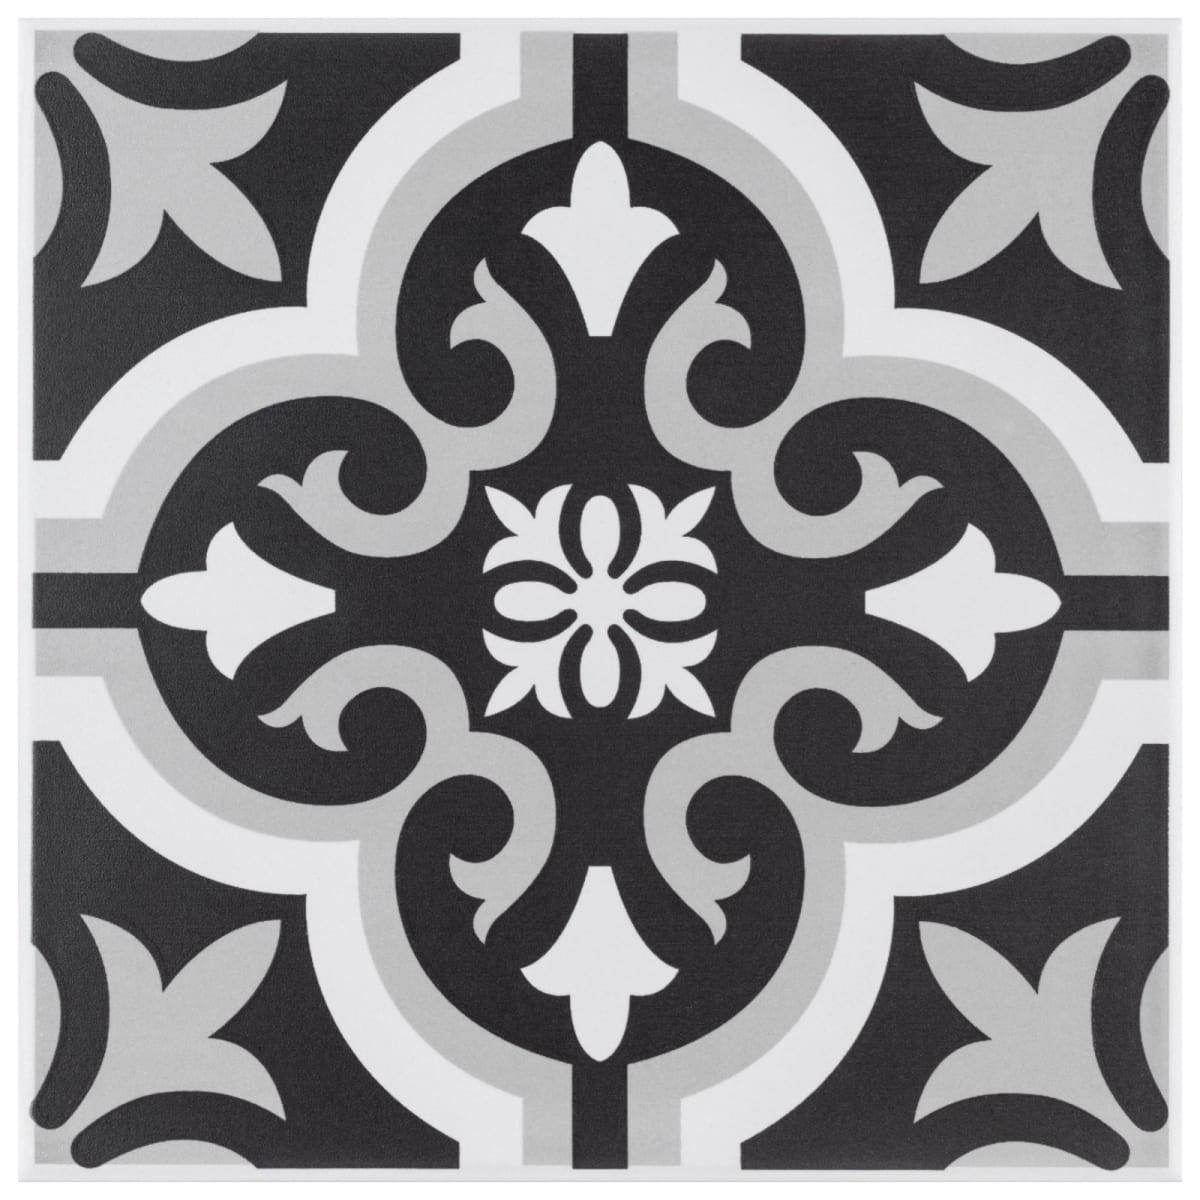 affinity tile ftc8brc2 sample